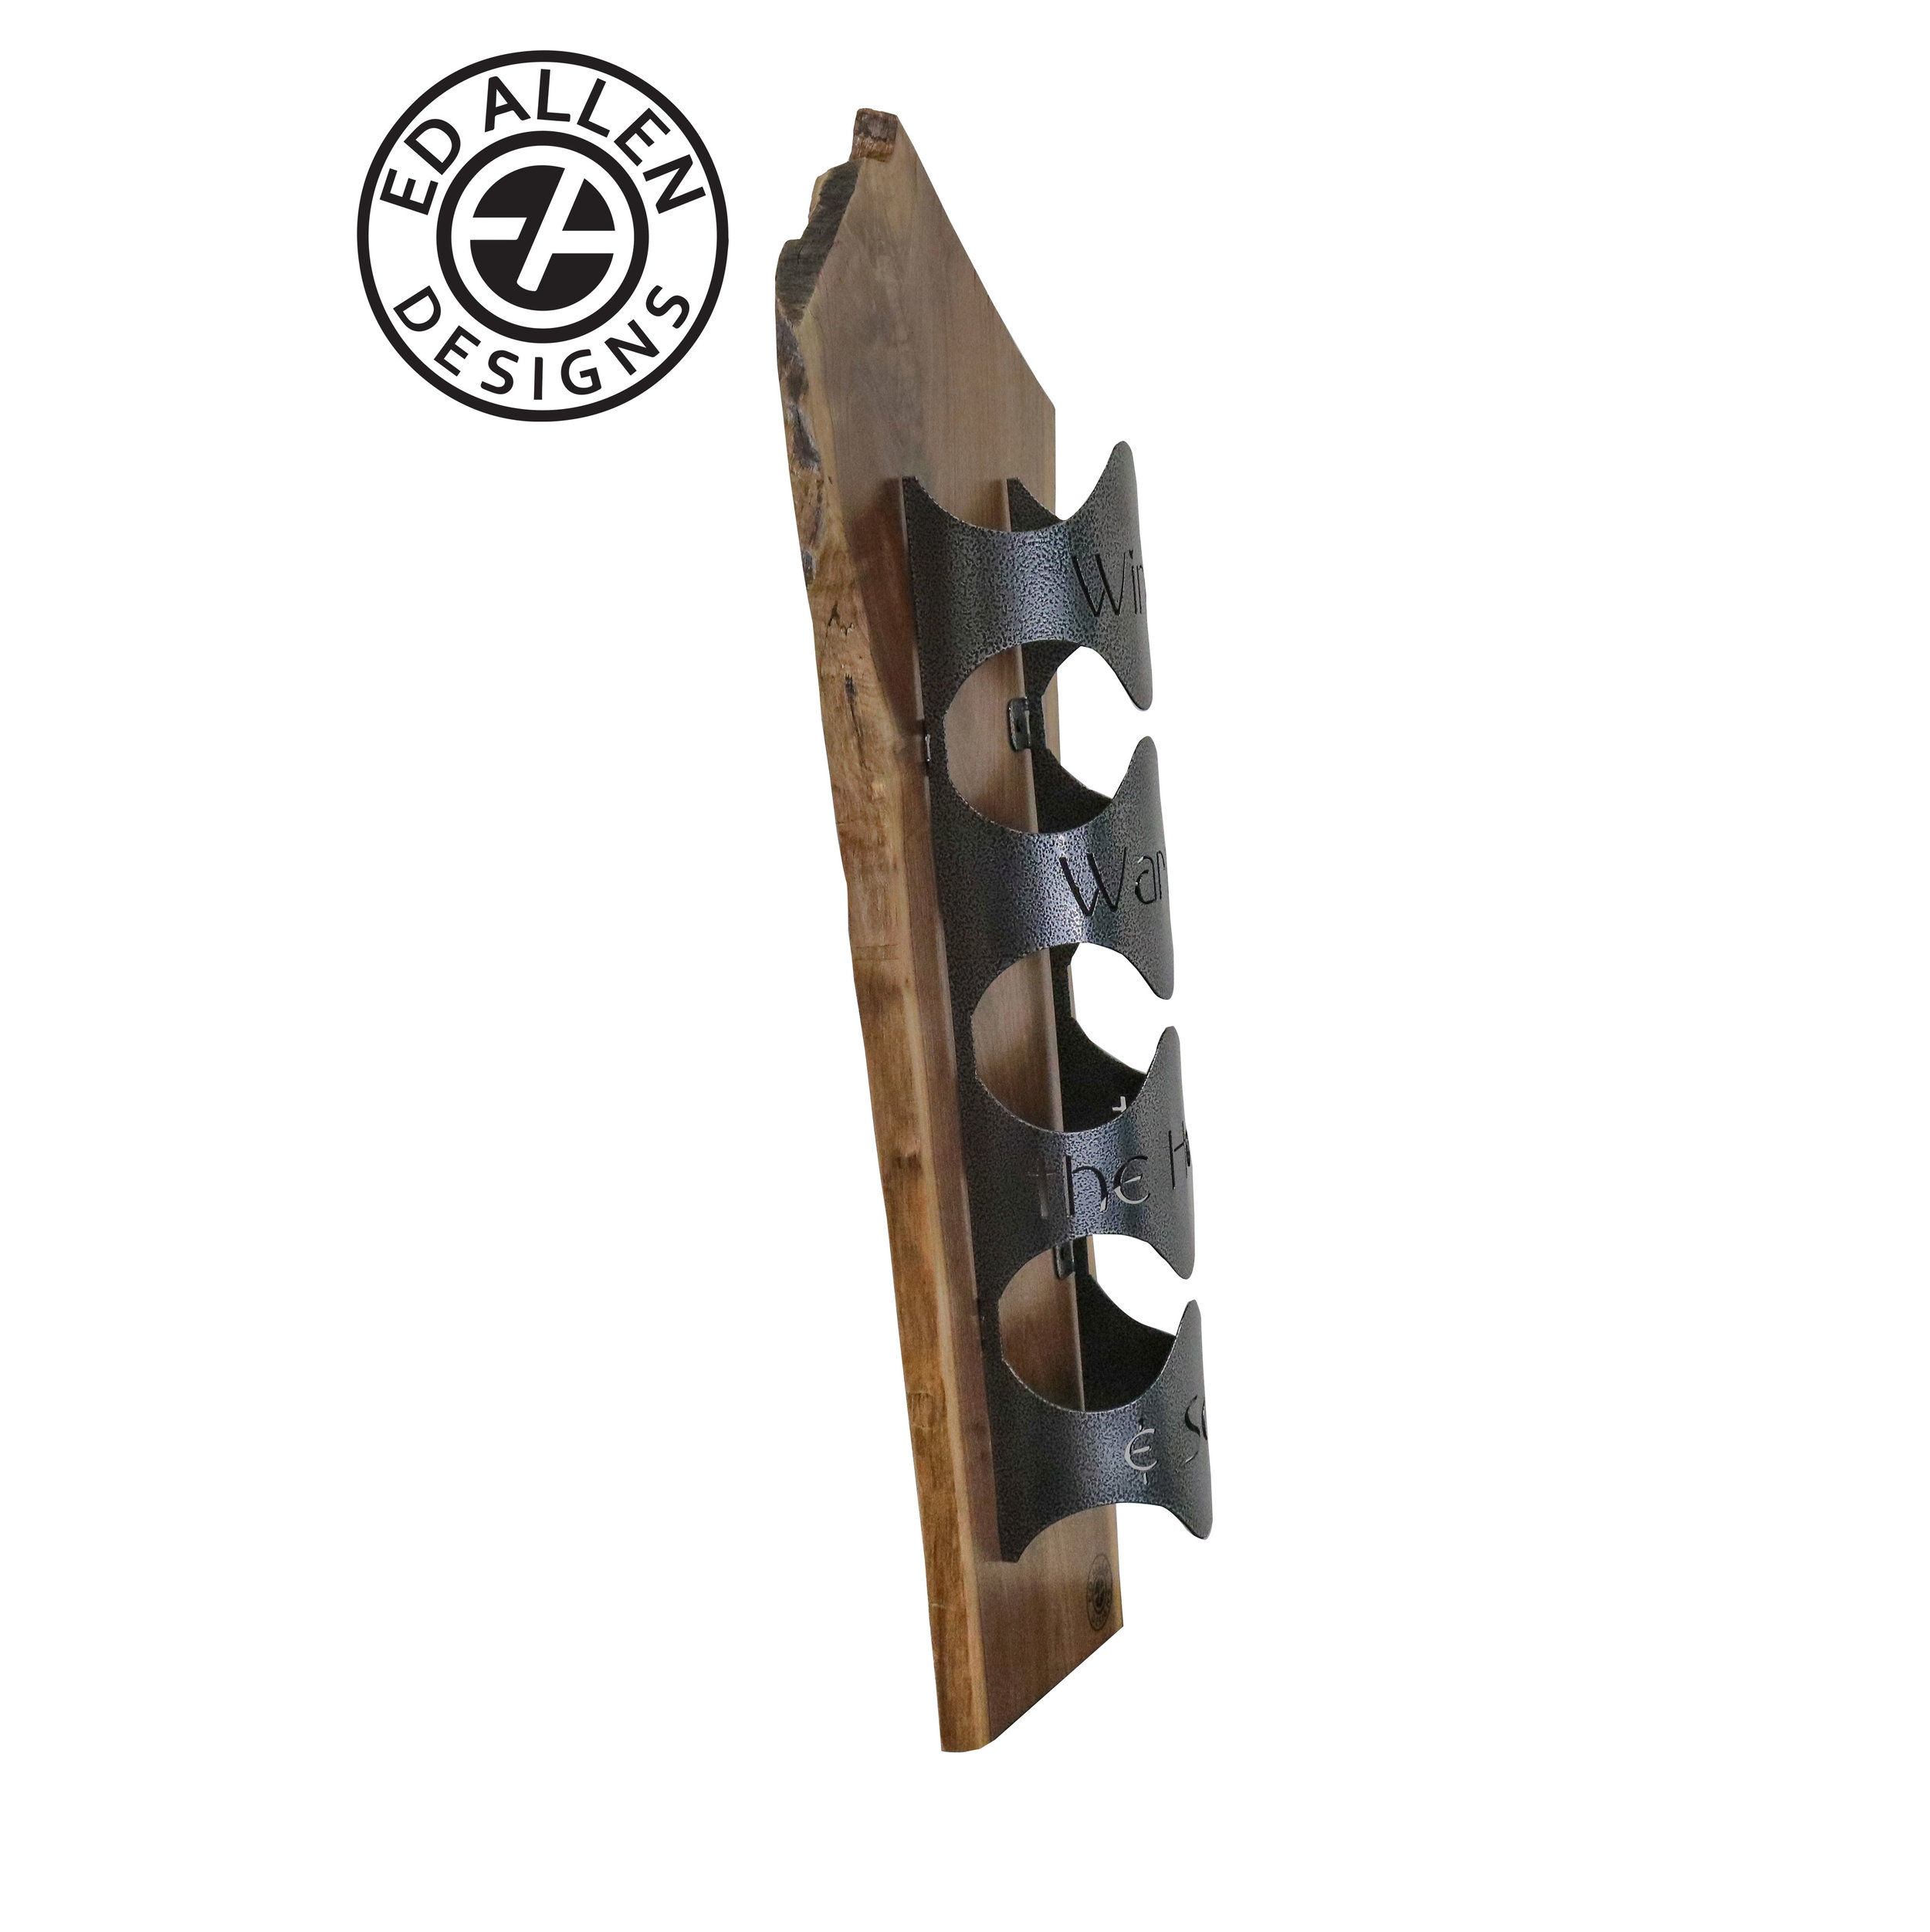 ed allen live edge wine rack ed allen designs live edge hardwood products